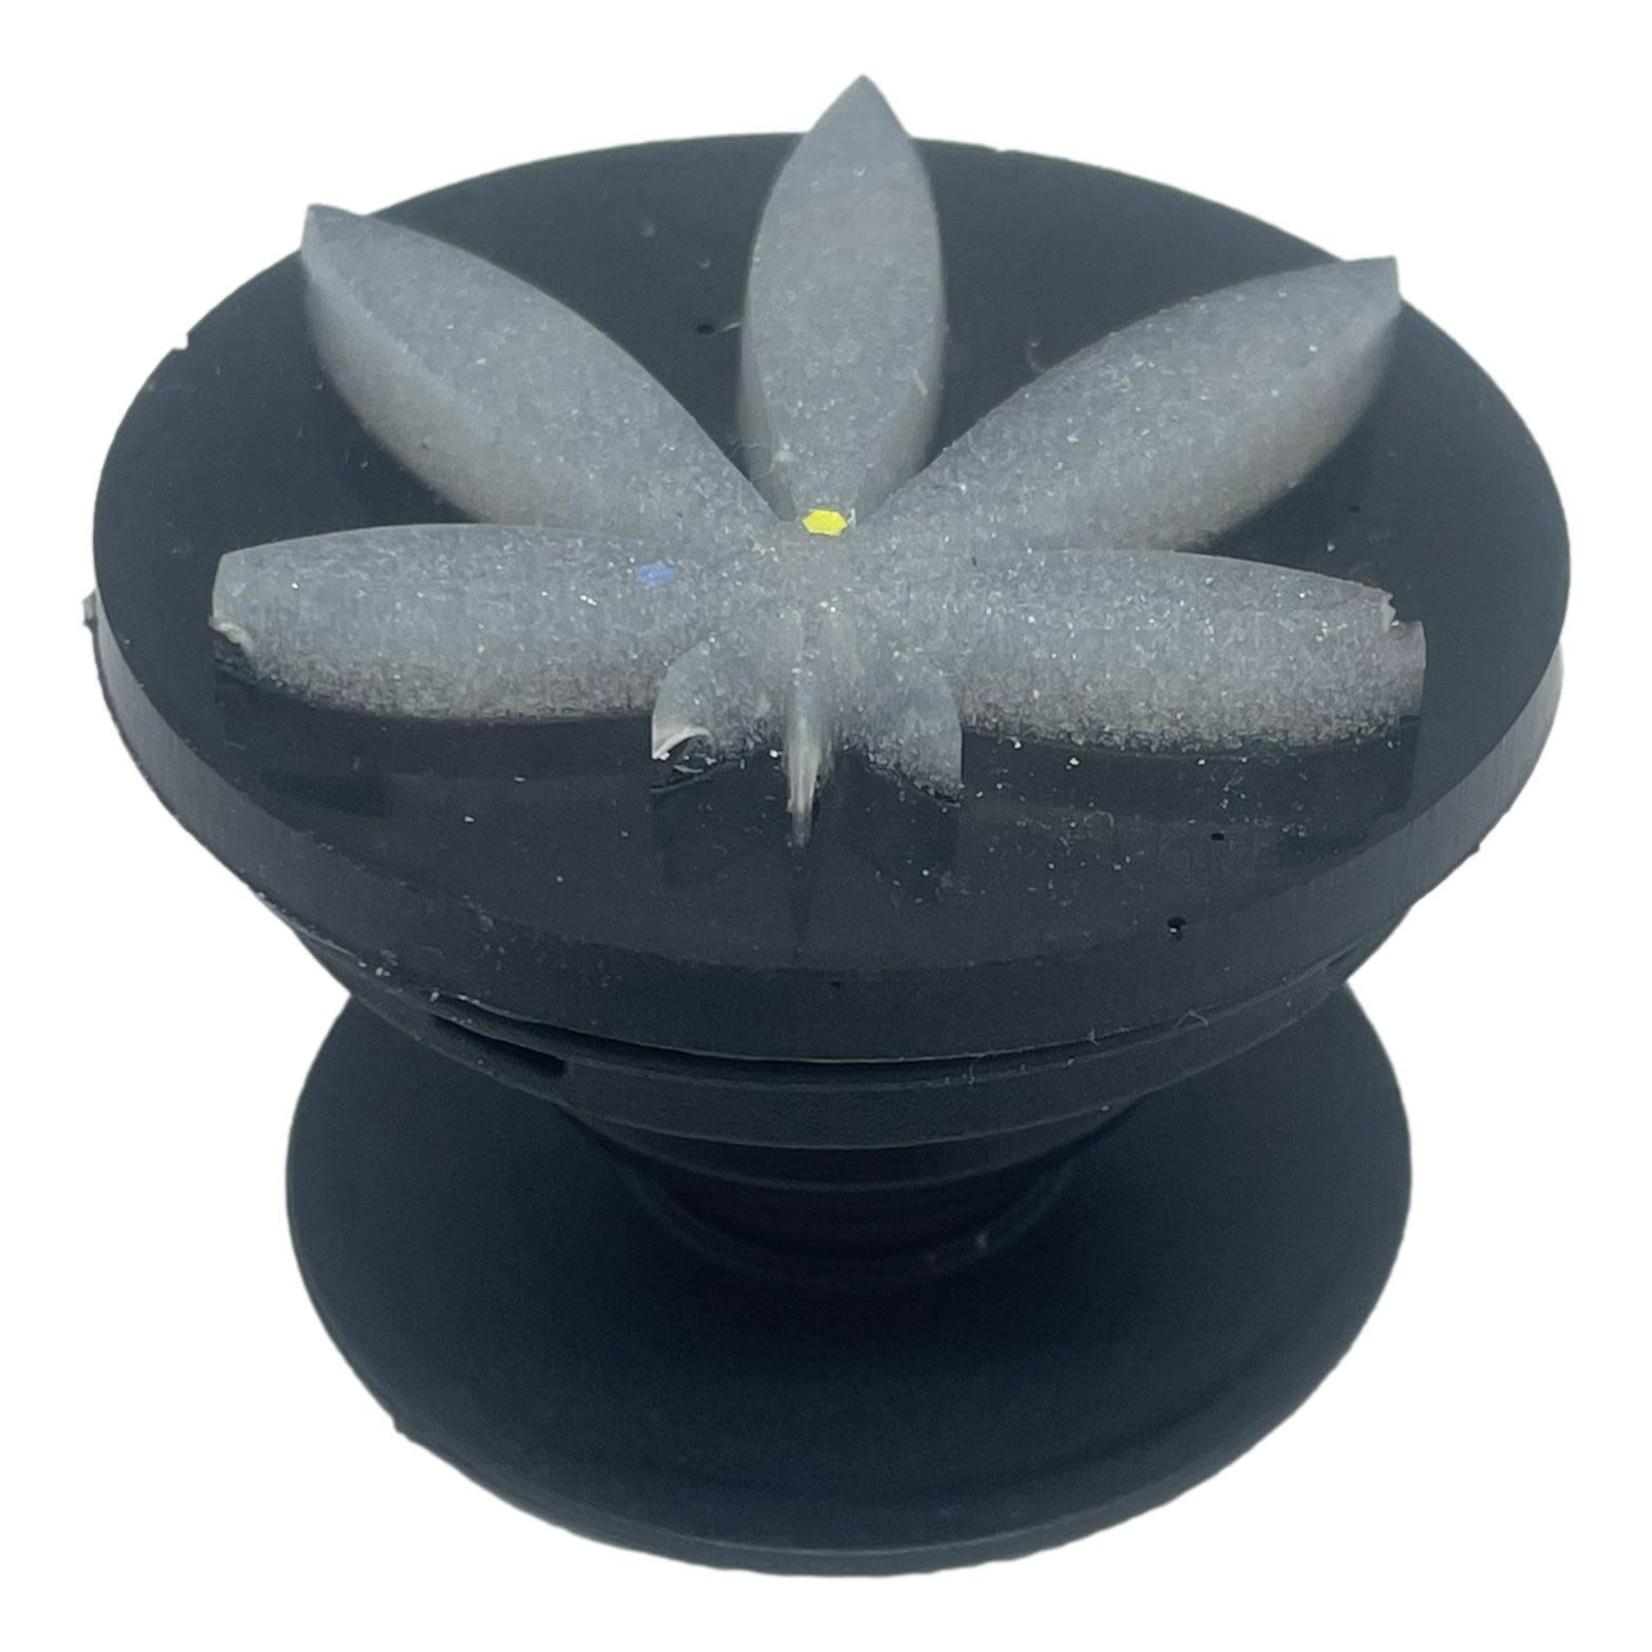 East Coast Sirens Black & White Weed Leaf Phone Grip